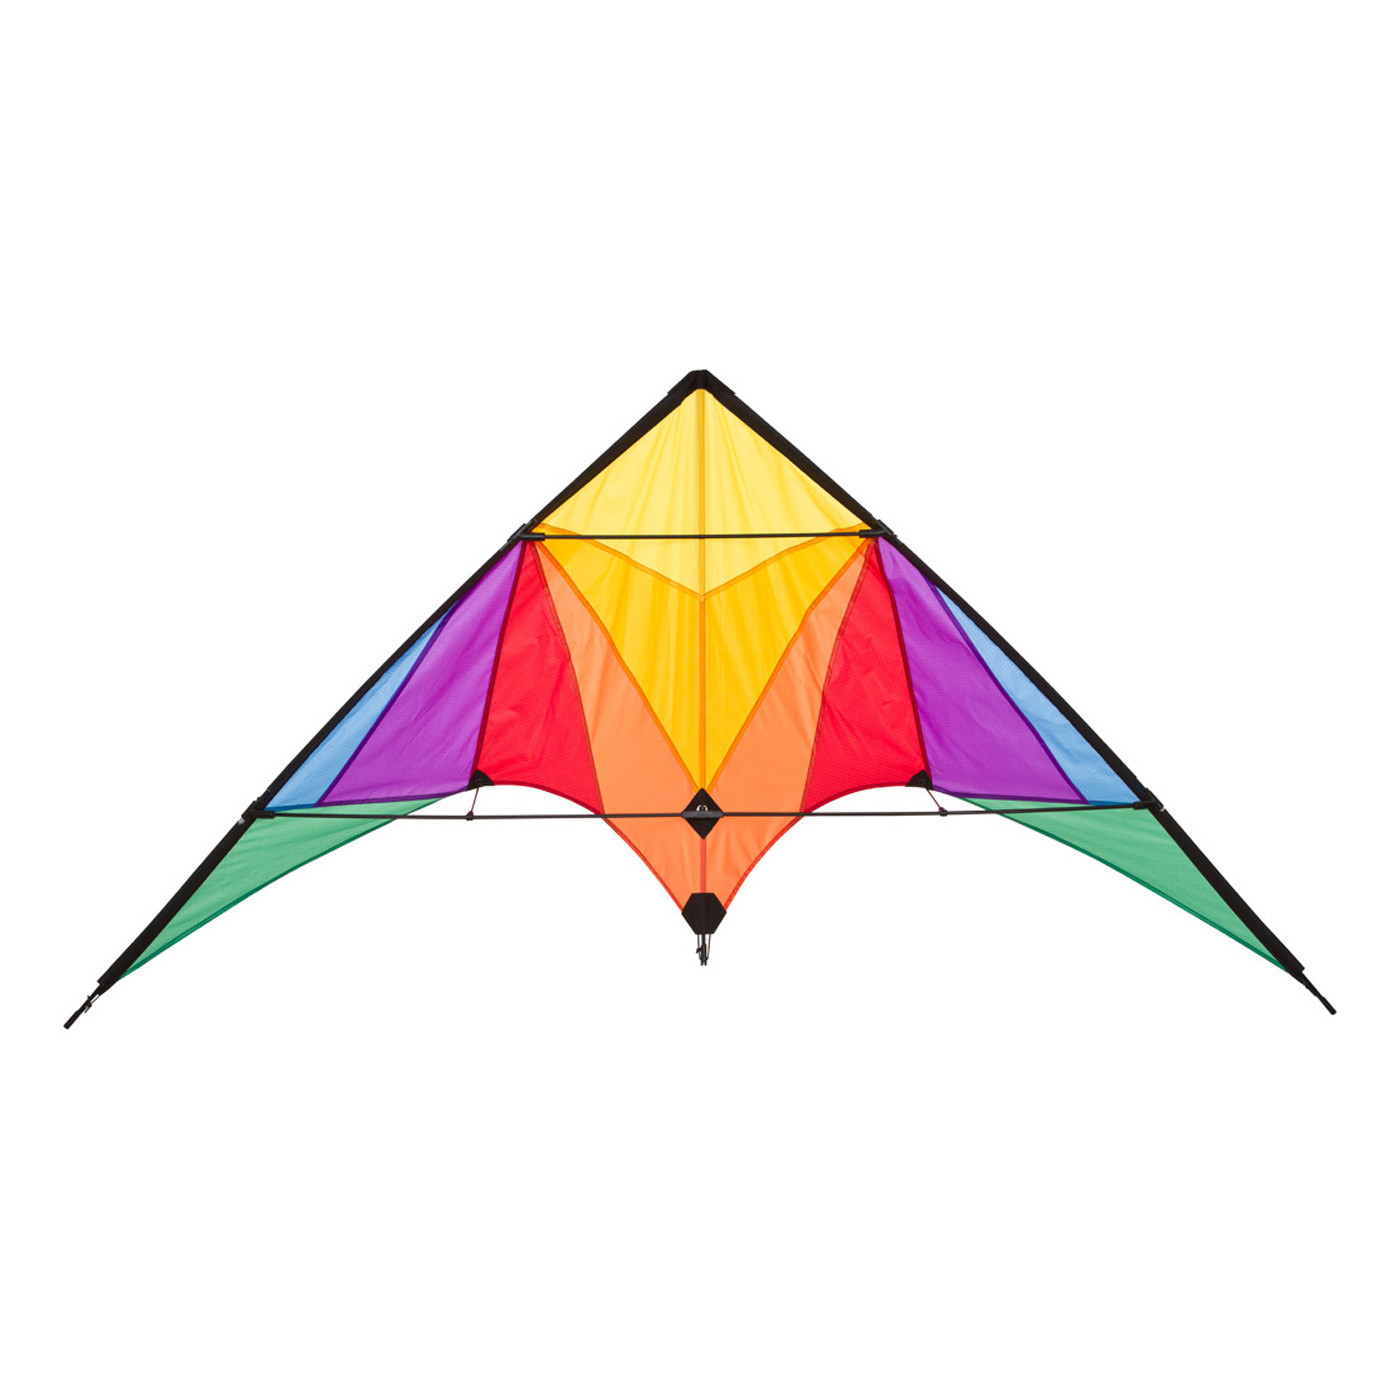 Stunt kite trigger rainbow stunt kites wind designs for Indoor kite design